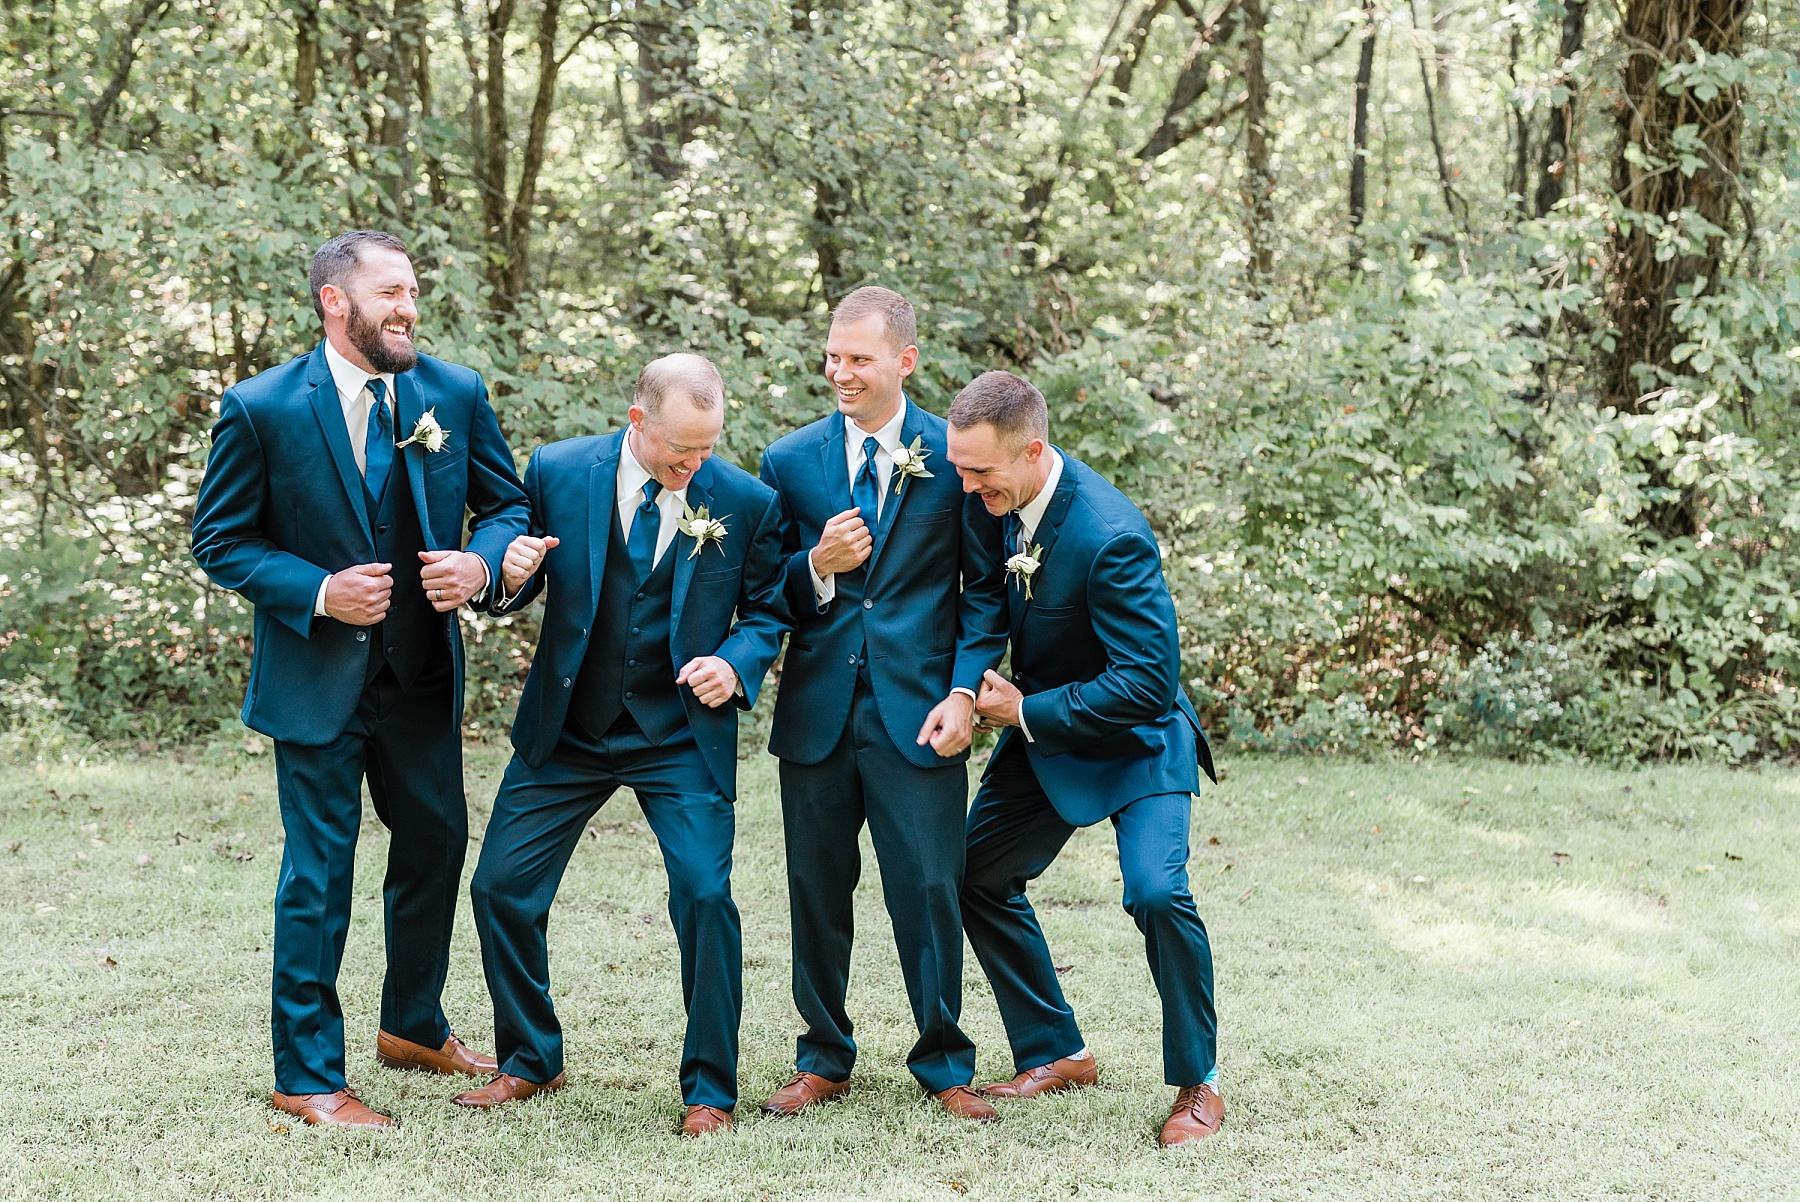 Romantic Summer Sunset Wedding Ceremony at Little Piney Lodge St. Louis Missouri by Kelsi Kliethermes Photography Fine Art Photographer_0023.jpg